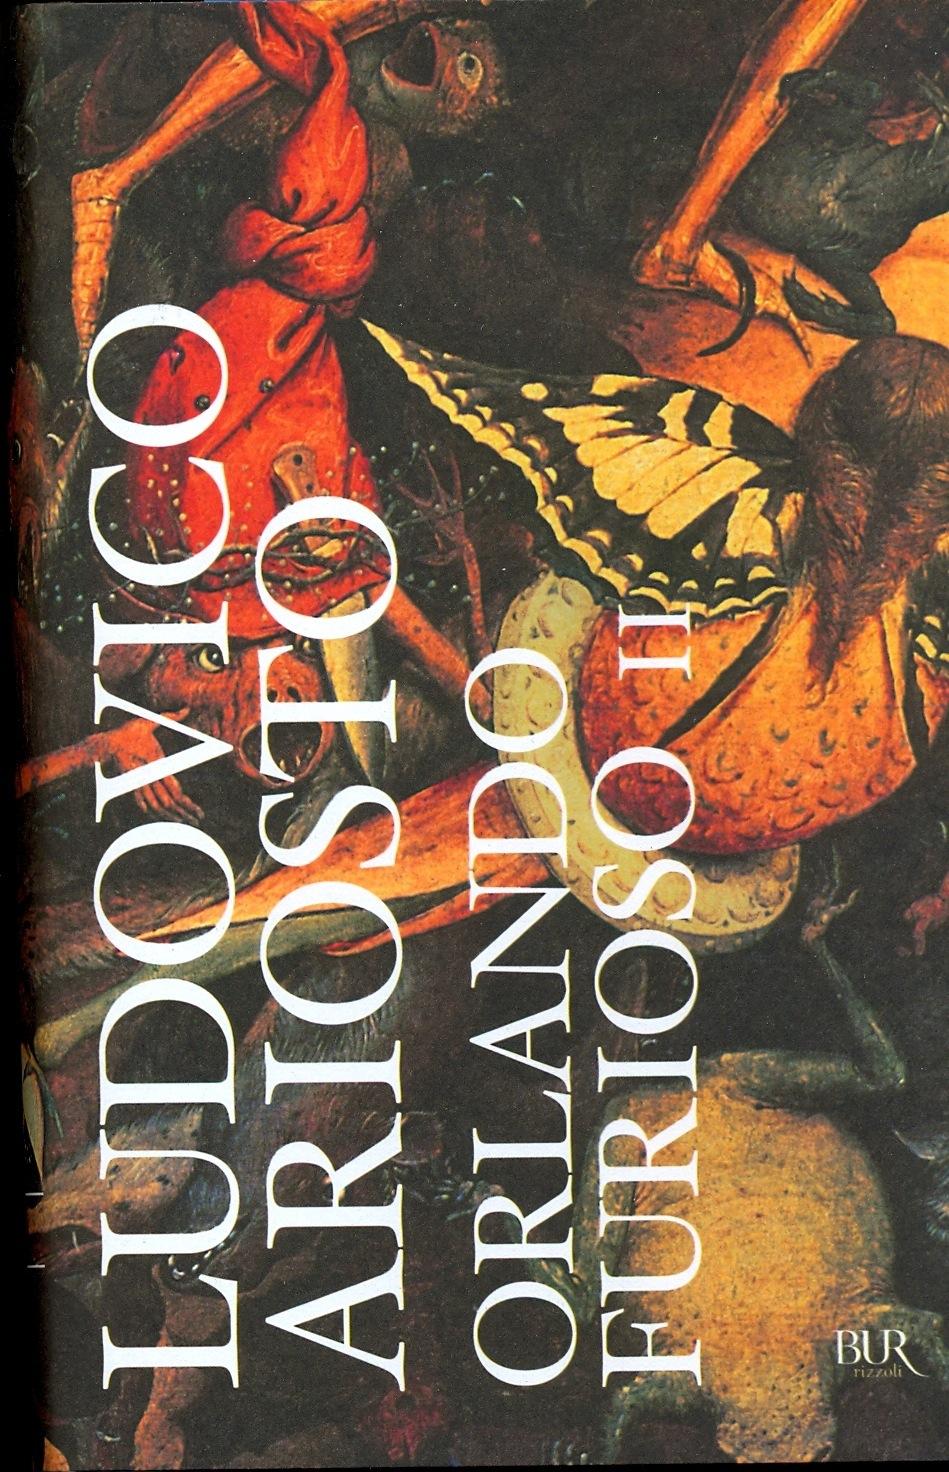 Orlando Furioso II